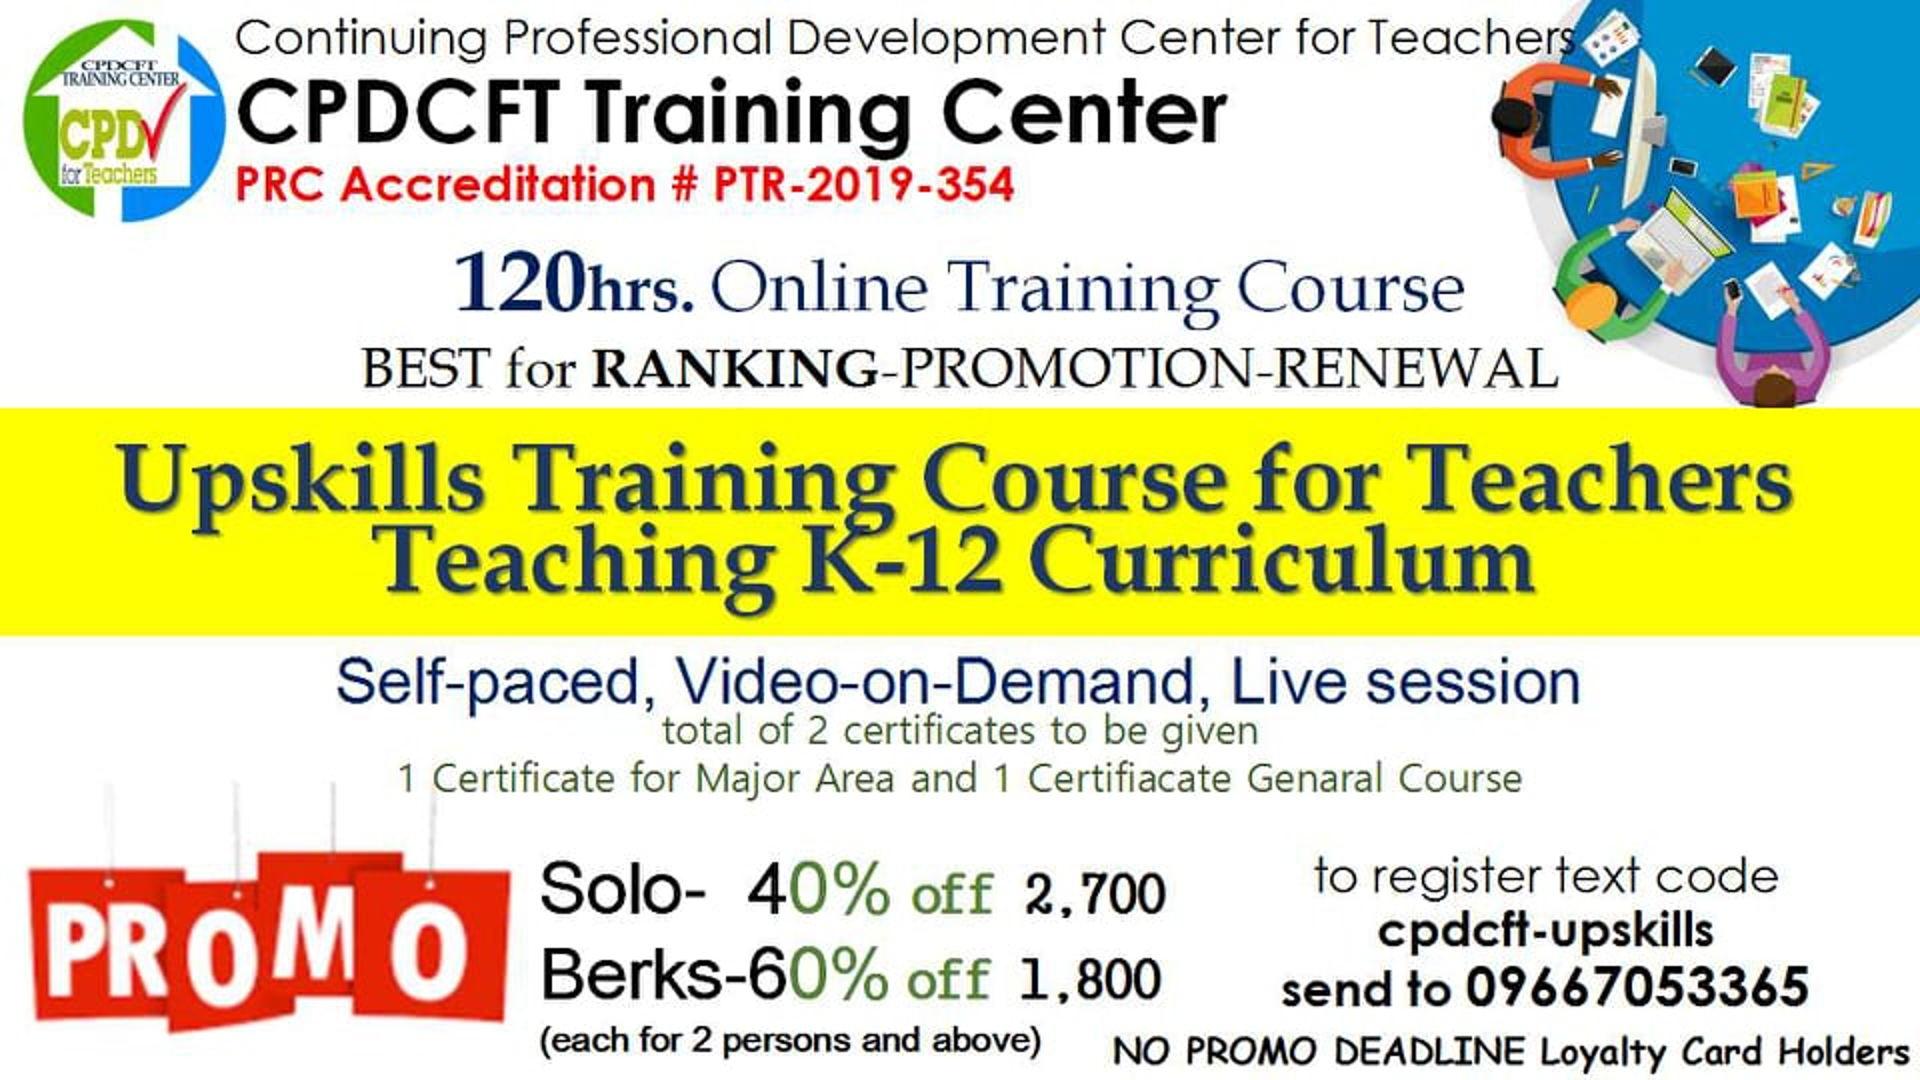 Upskills Teacher Training for Teachers Teaching K-12 Curriculum